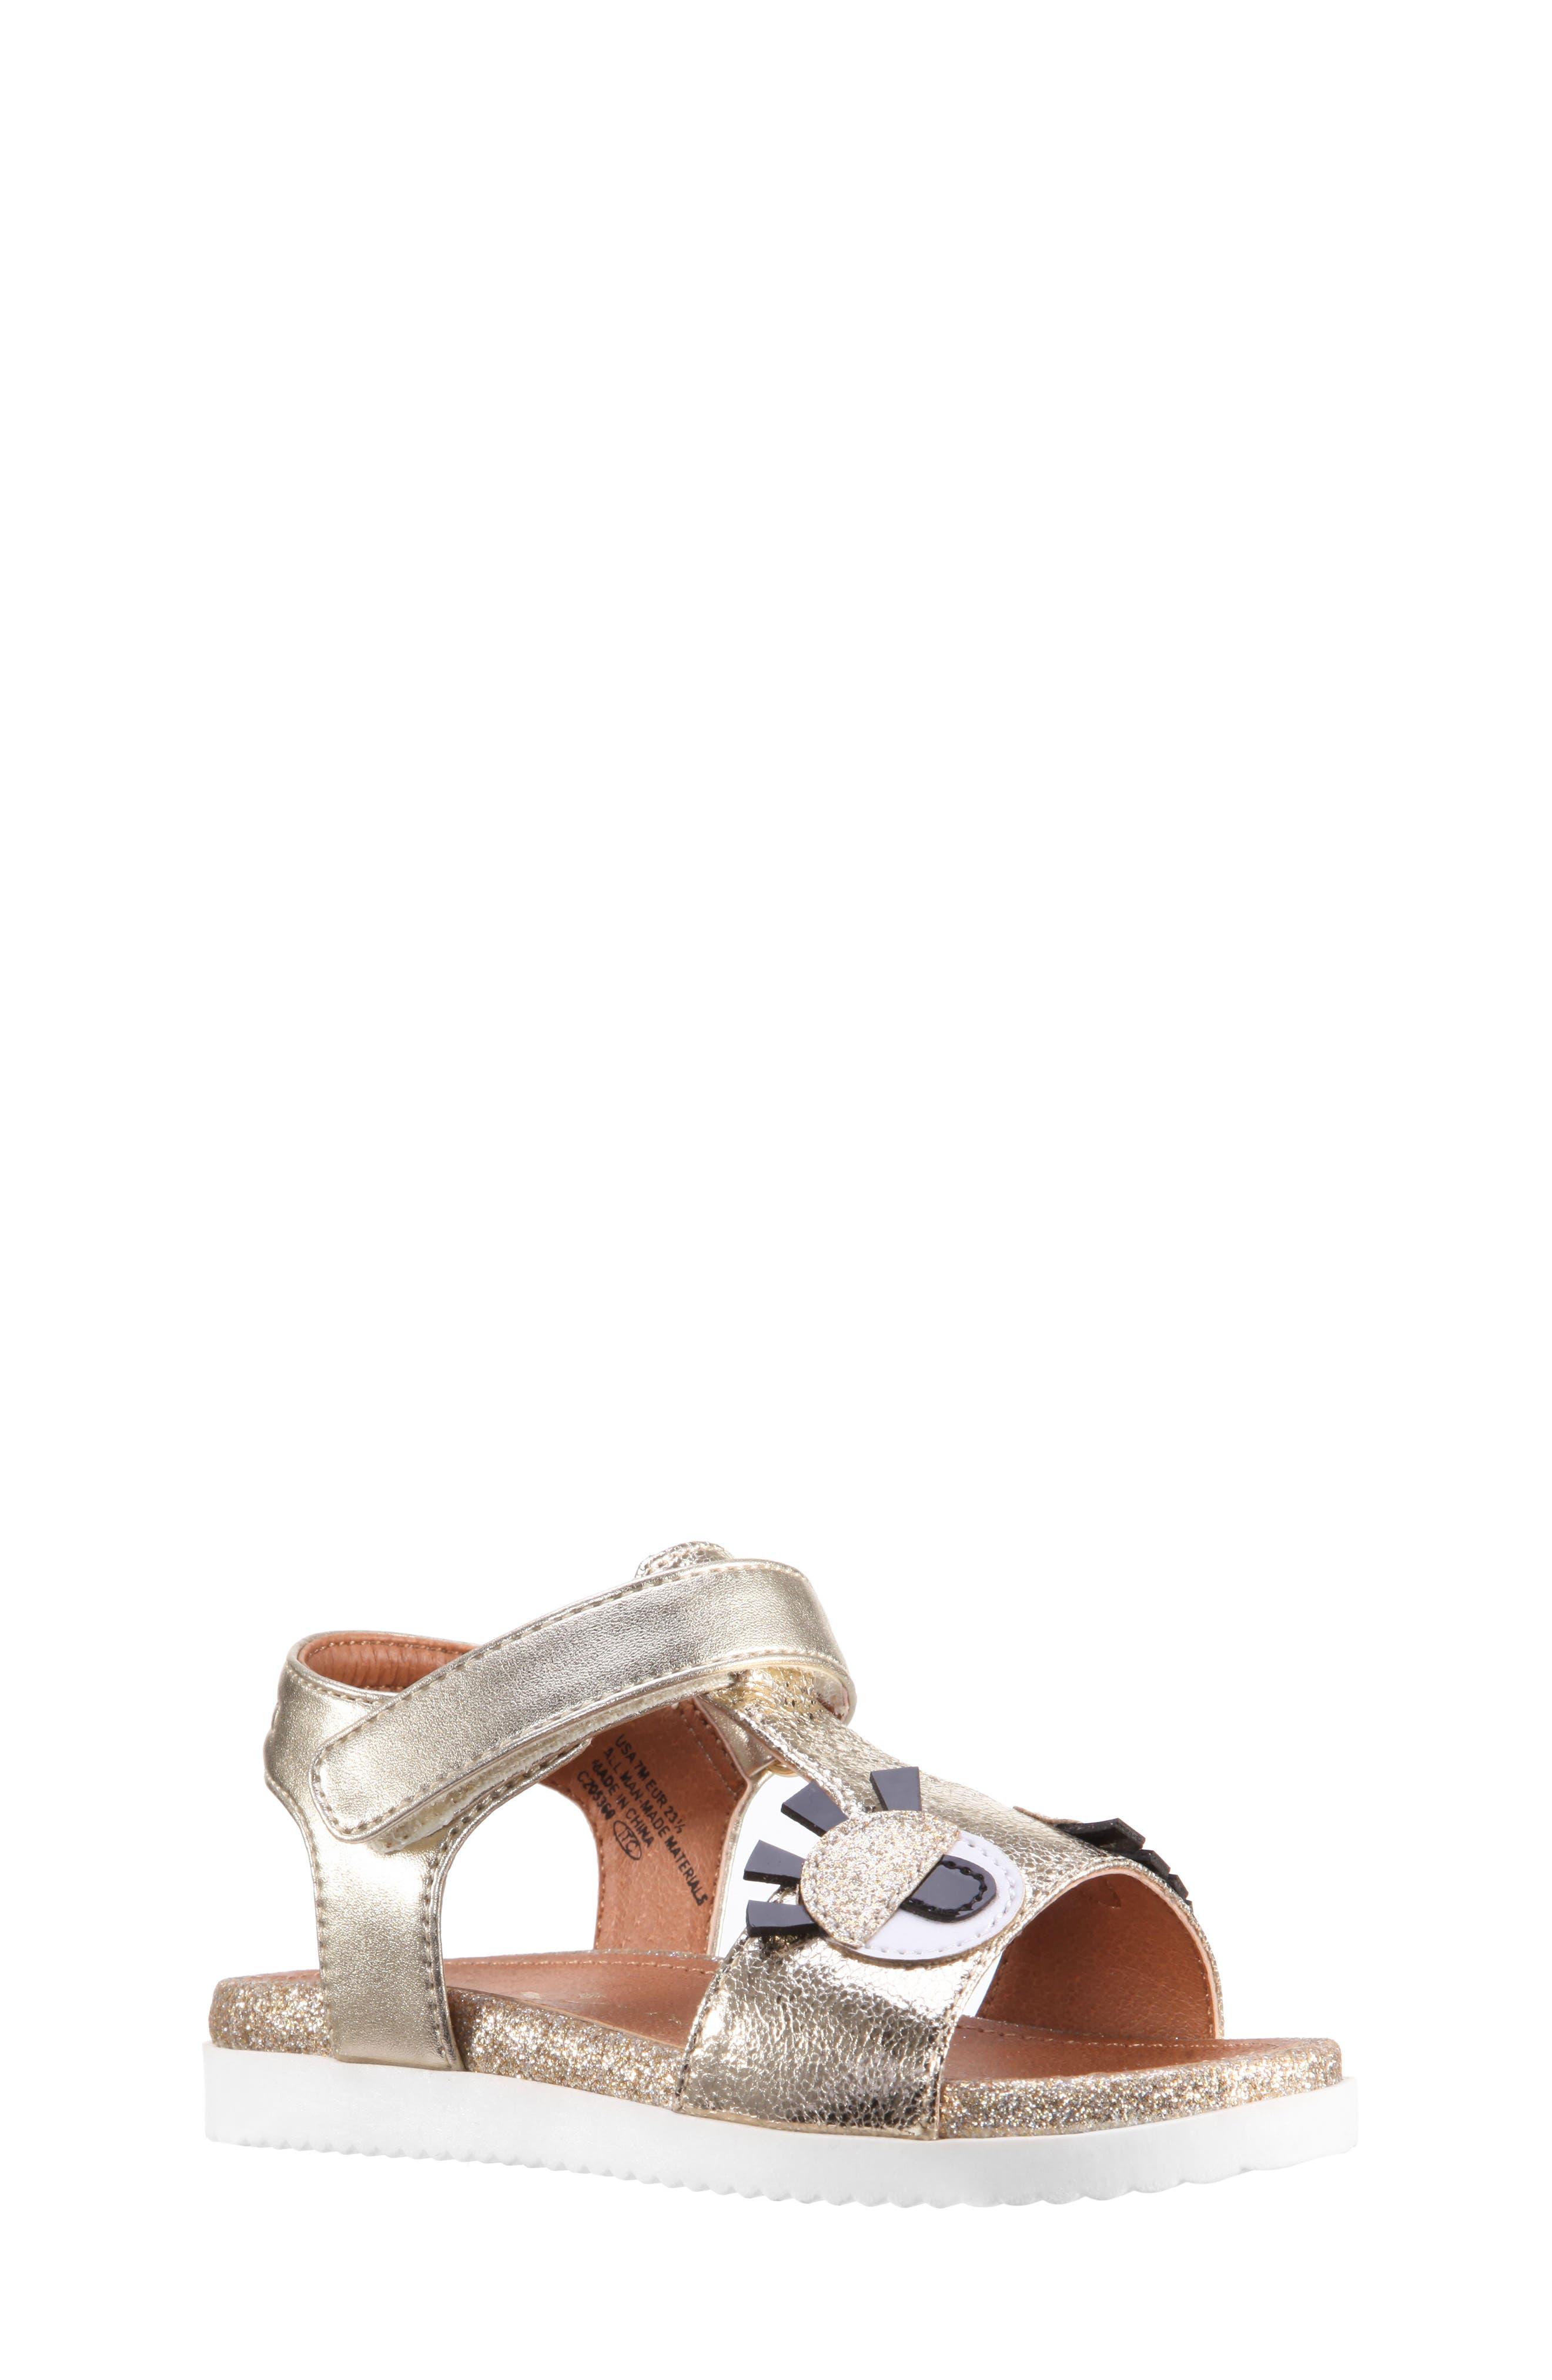 Luciella Wink Sandal,                         Main,                         color, Platino Metallic Crackle